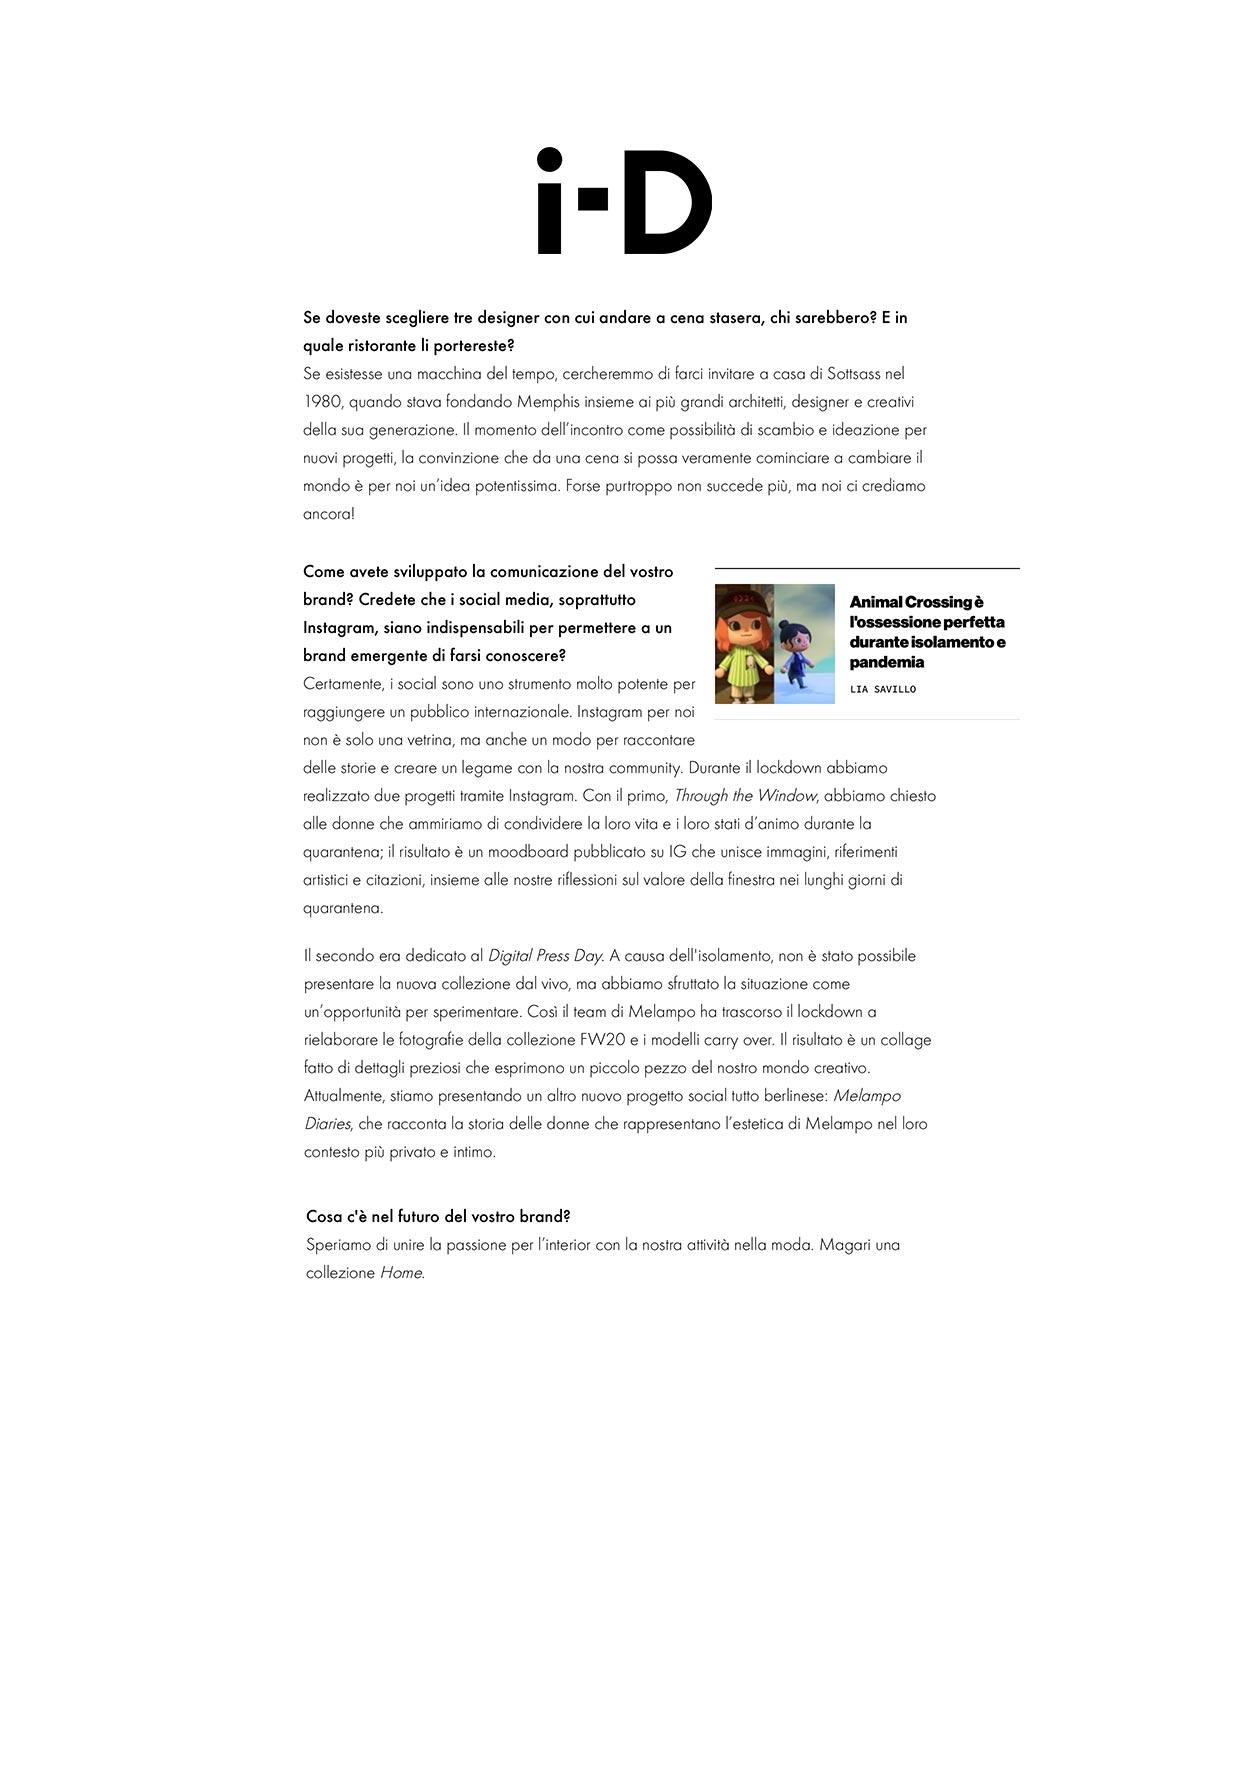 melampo interview on i.D magazine - photo 4